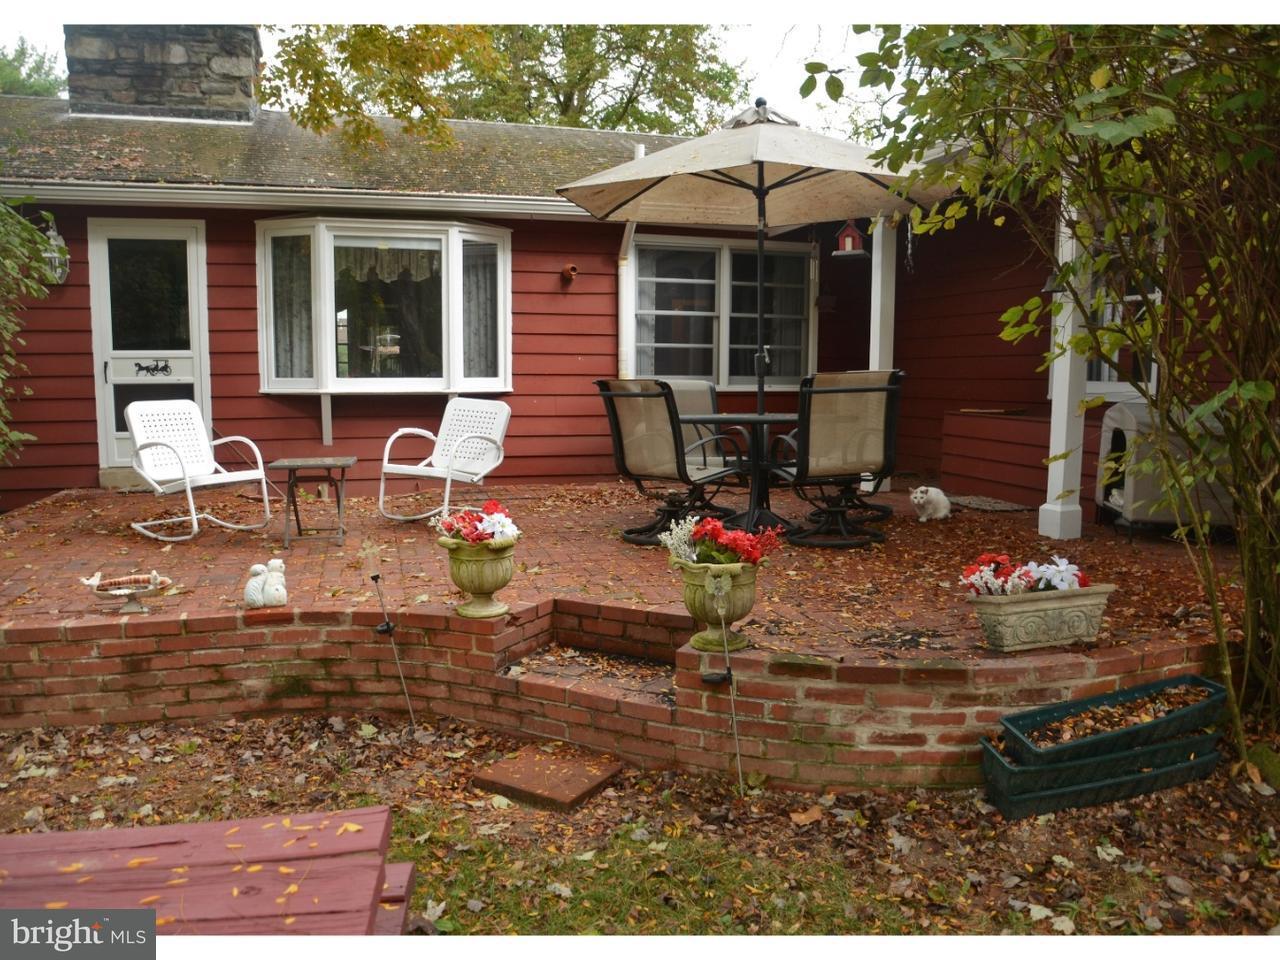 Single Family Home for Sale at 123 E WELSH Road Maple Glen, Pennsylvania 19002 United States